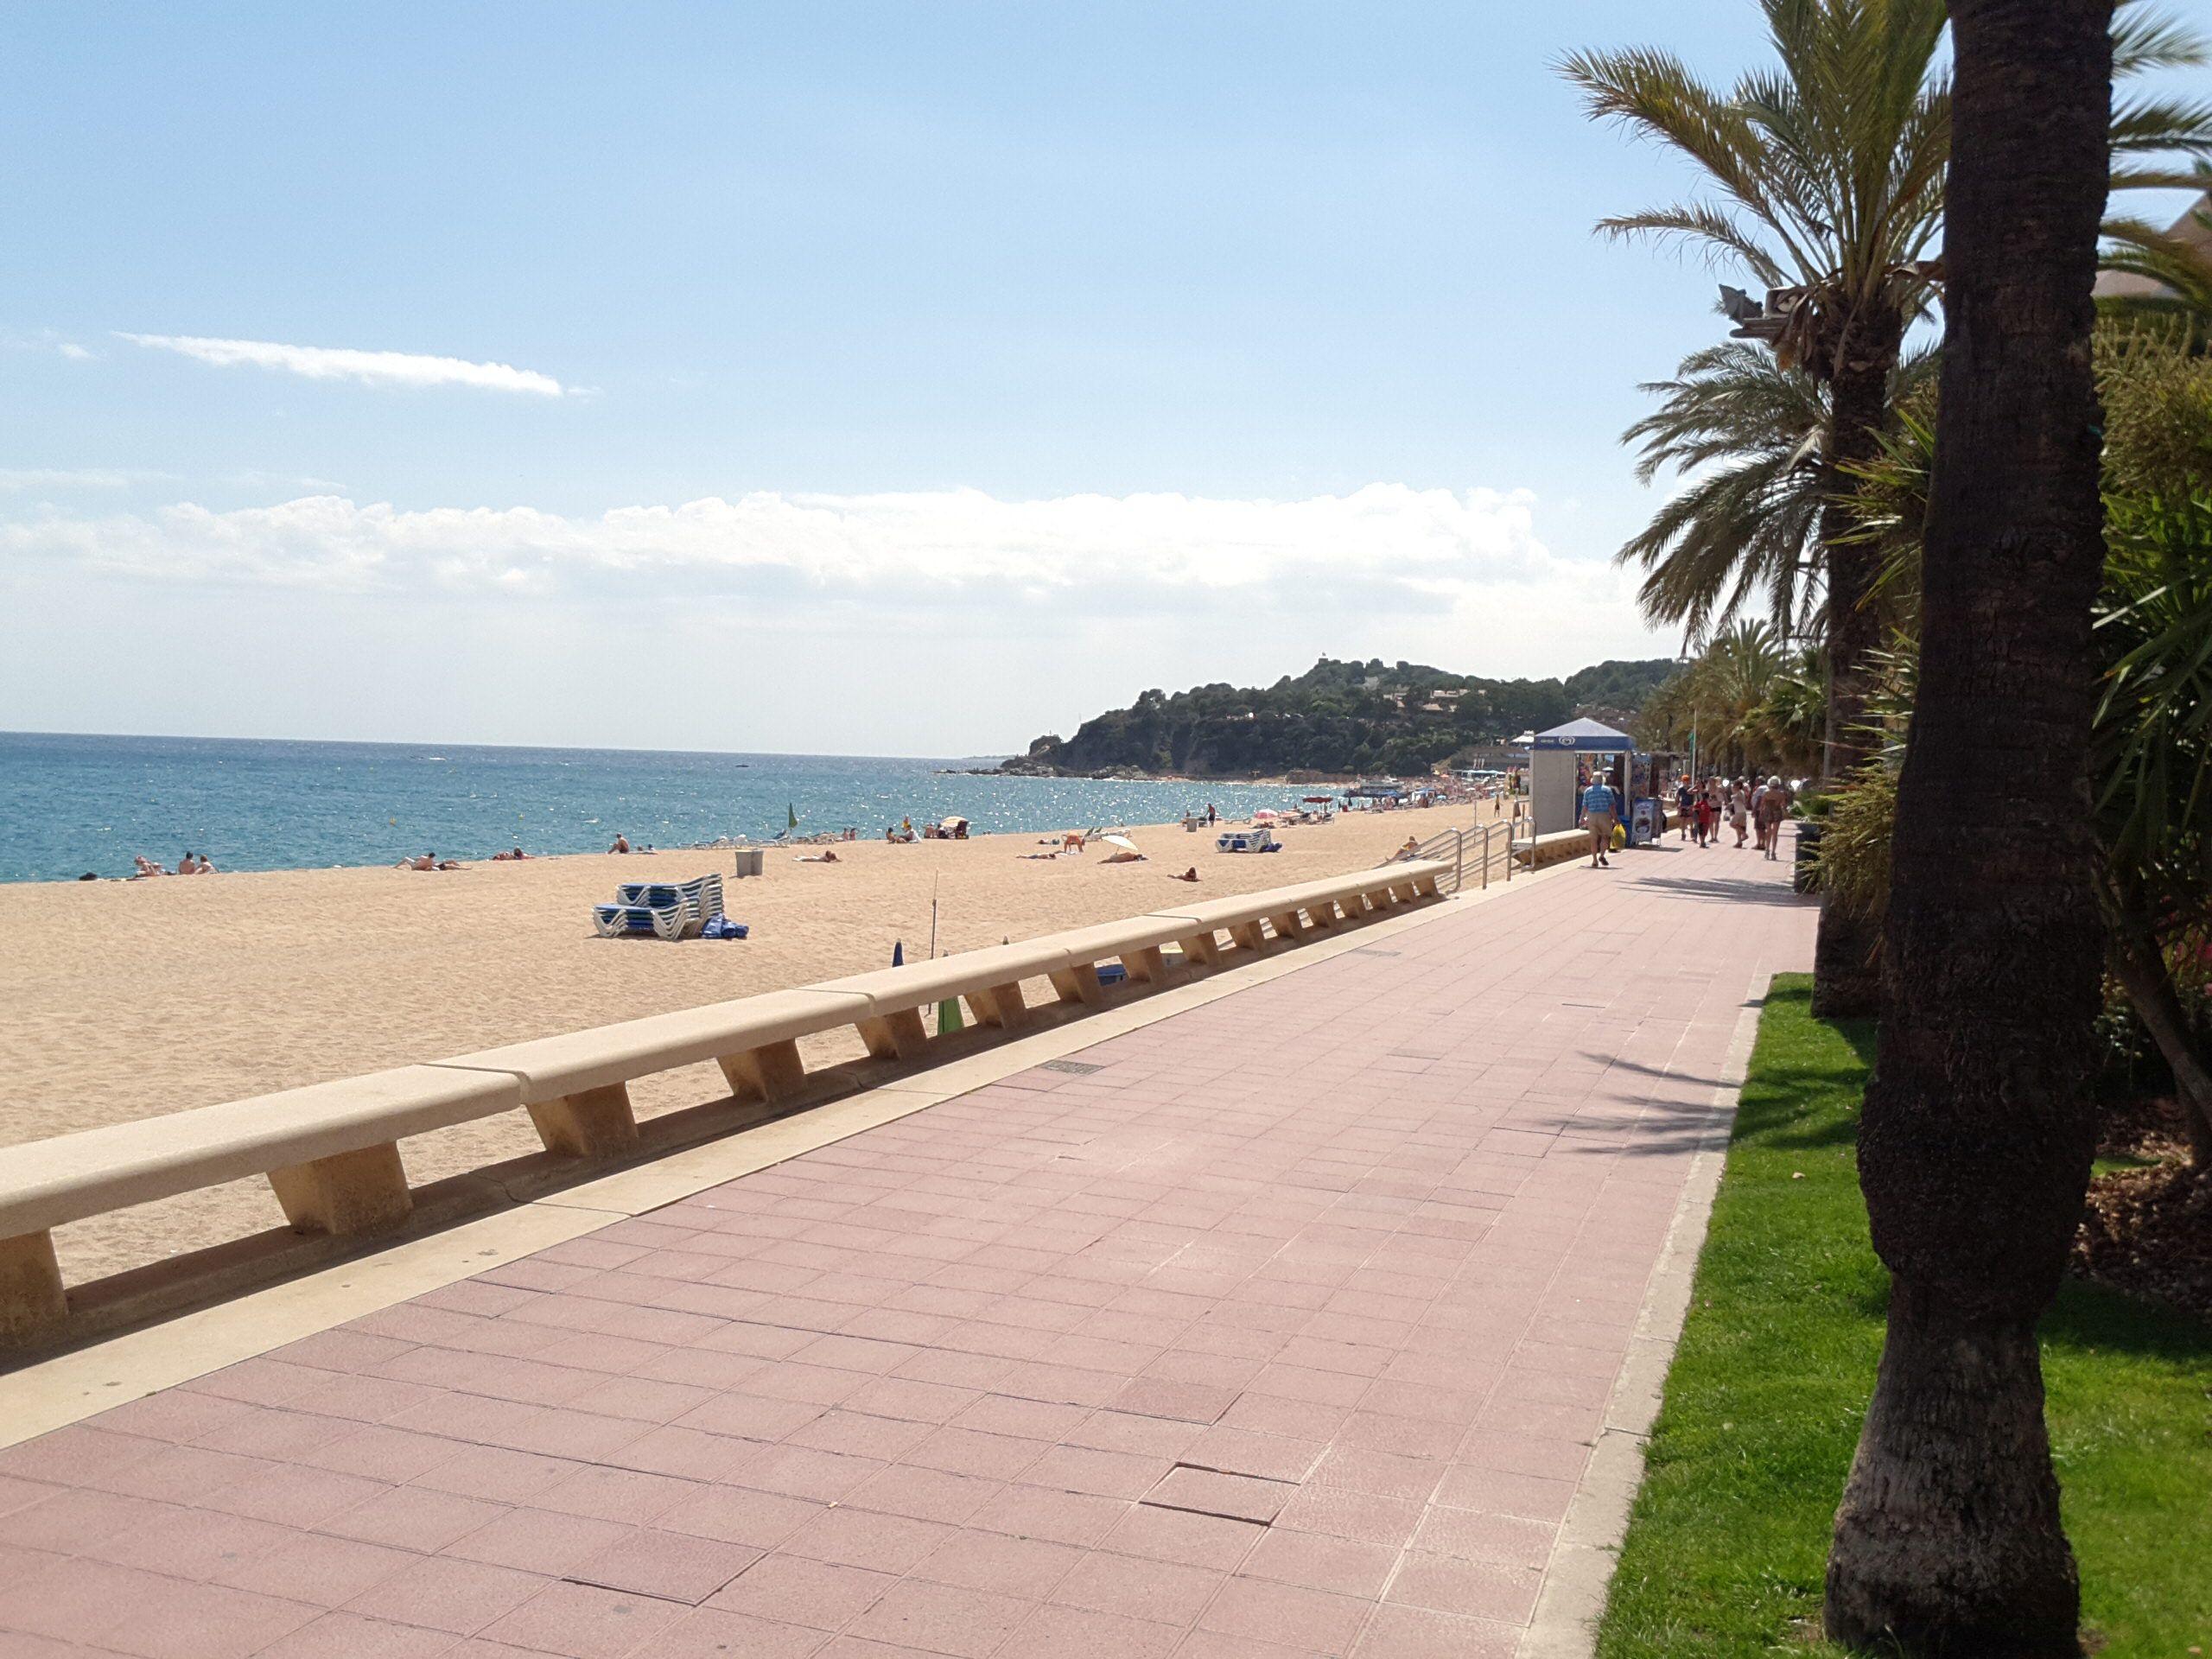 beach and promenade